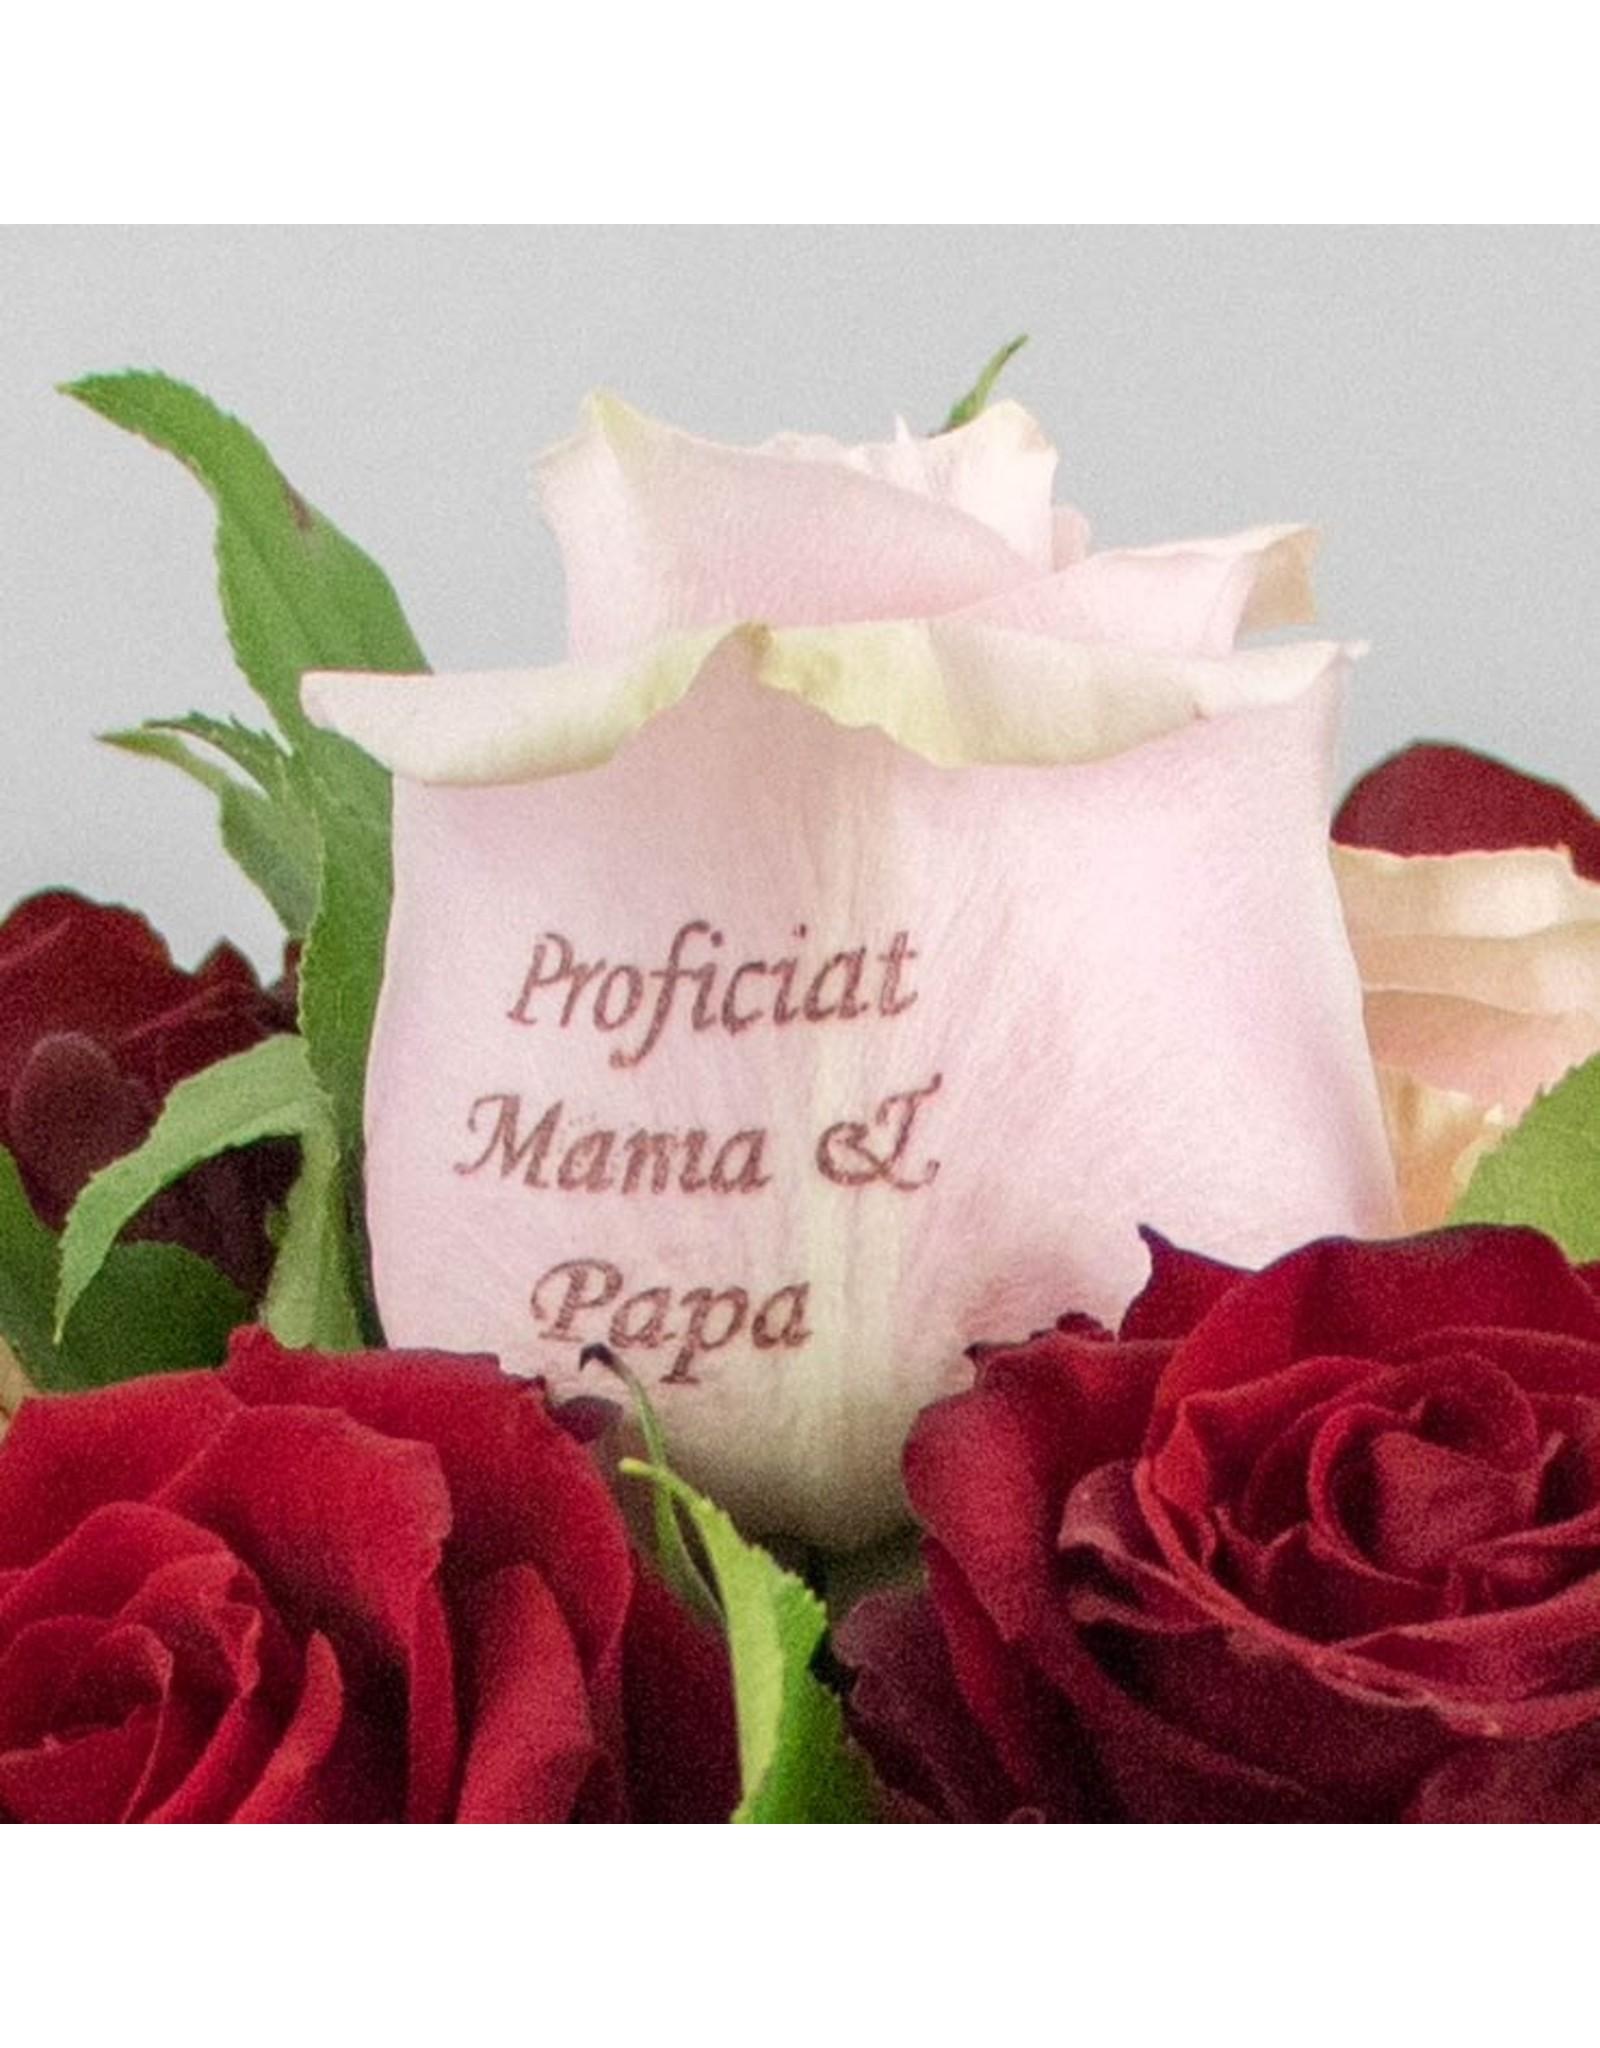 Magic Flowers Boeket 15 rozen - Rood/Roze - Proficiat Mama & Papa